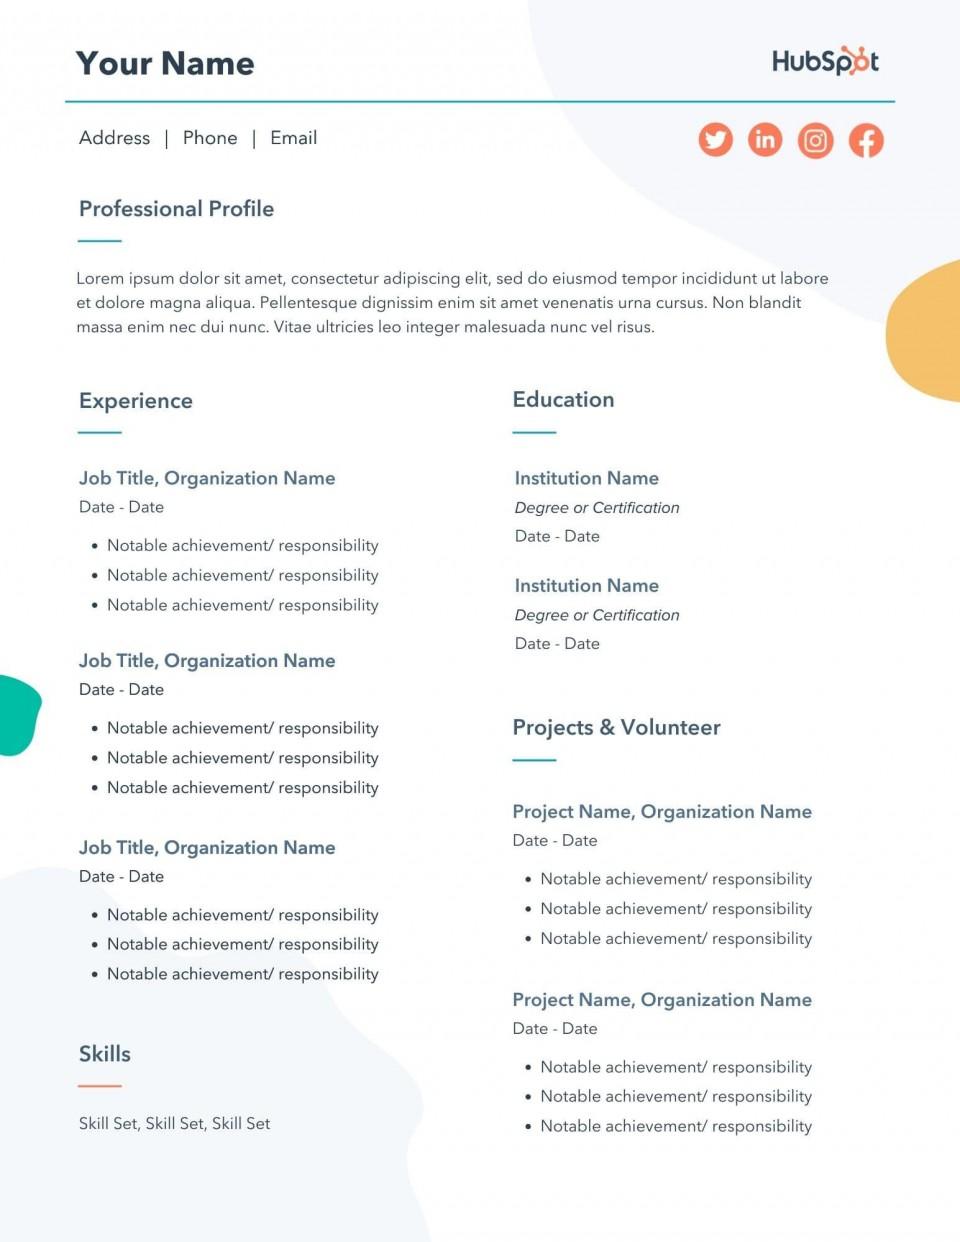 004 Impressive Resume Microsoft Word Template Inspiration  Cv/resume Design Tutorial With Federal Download960